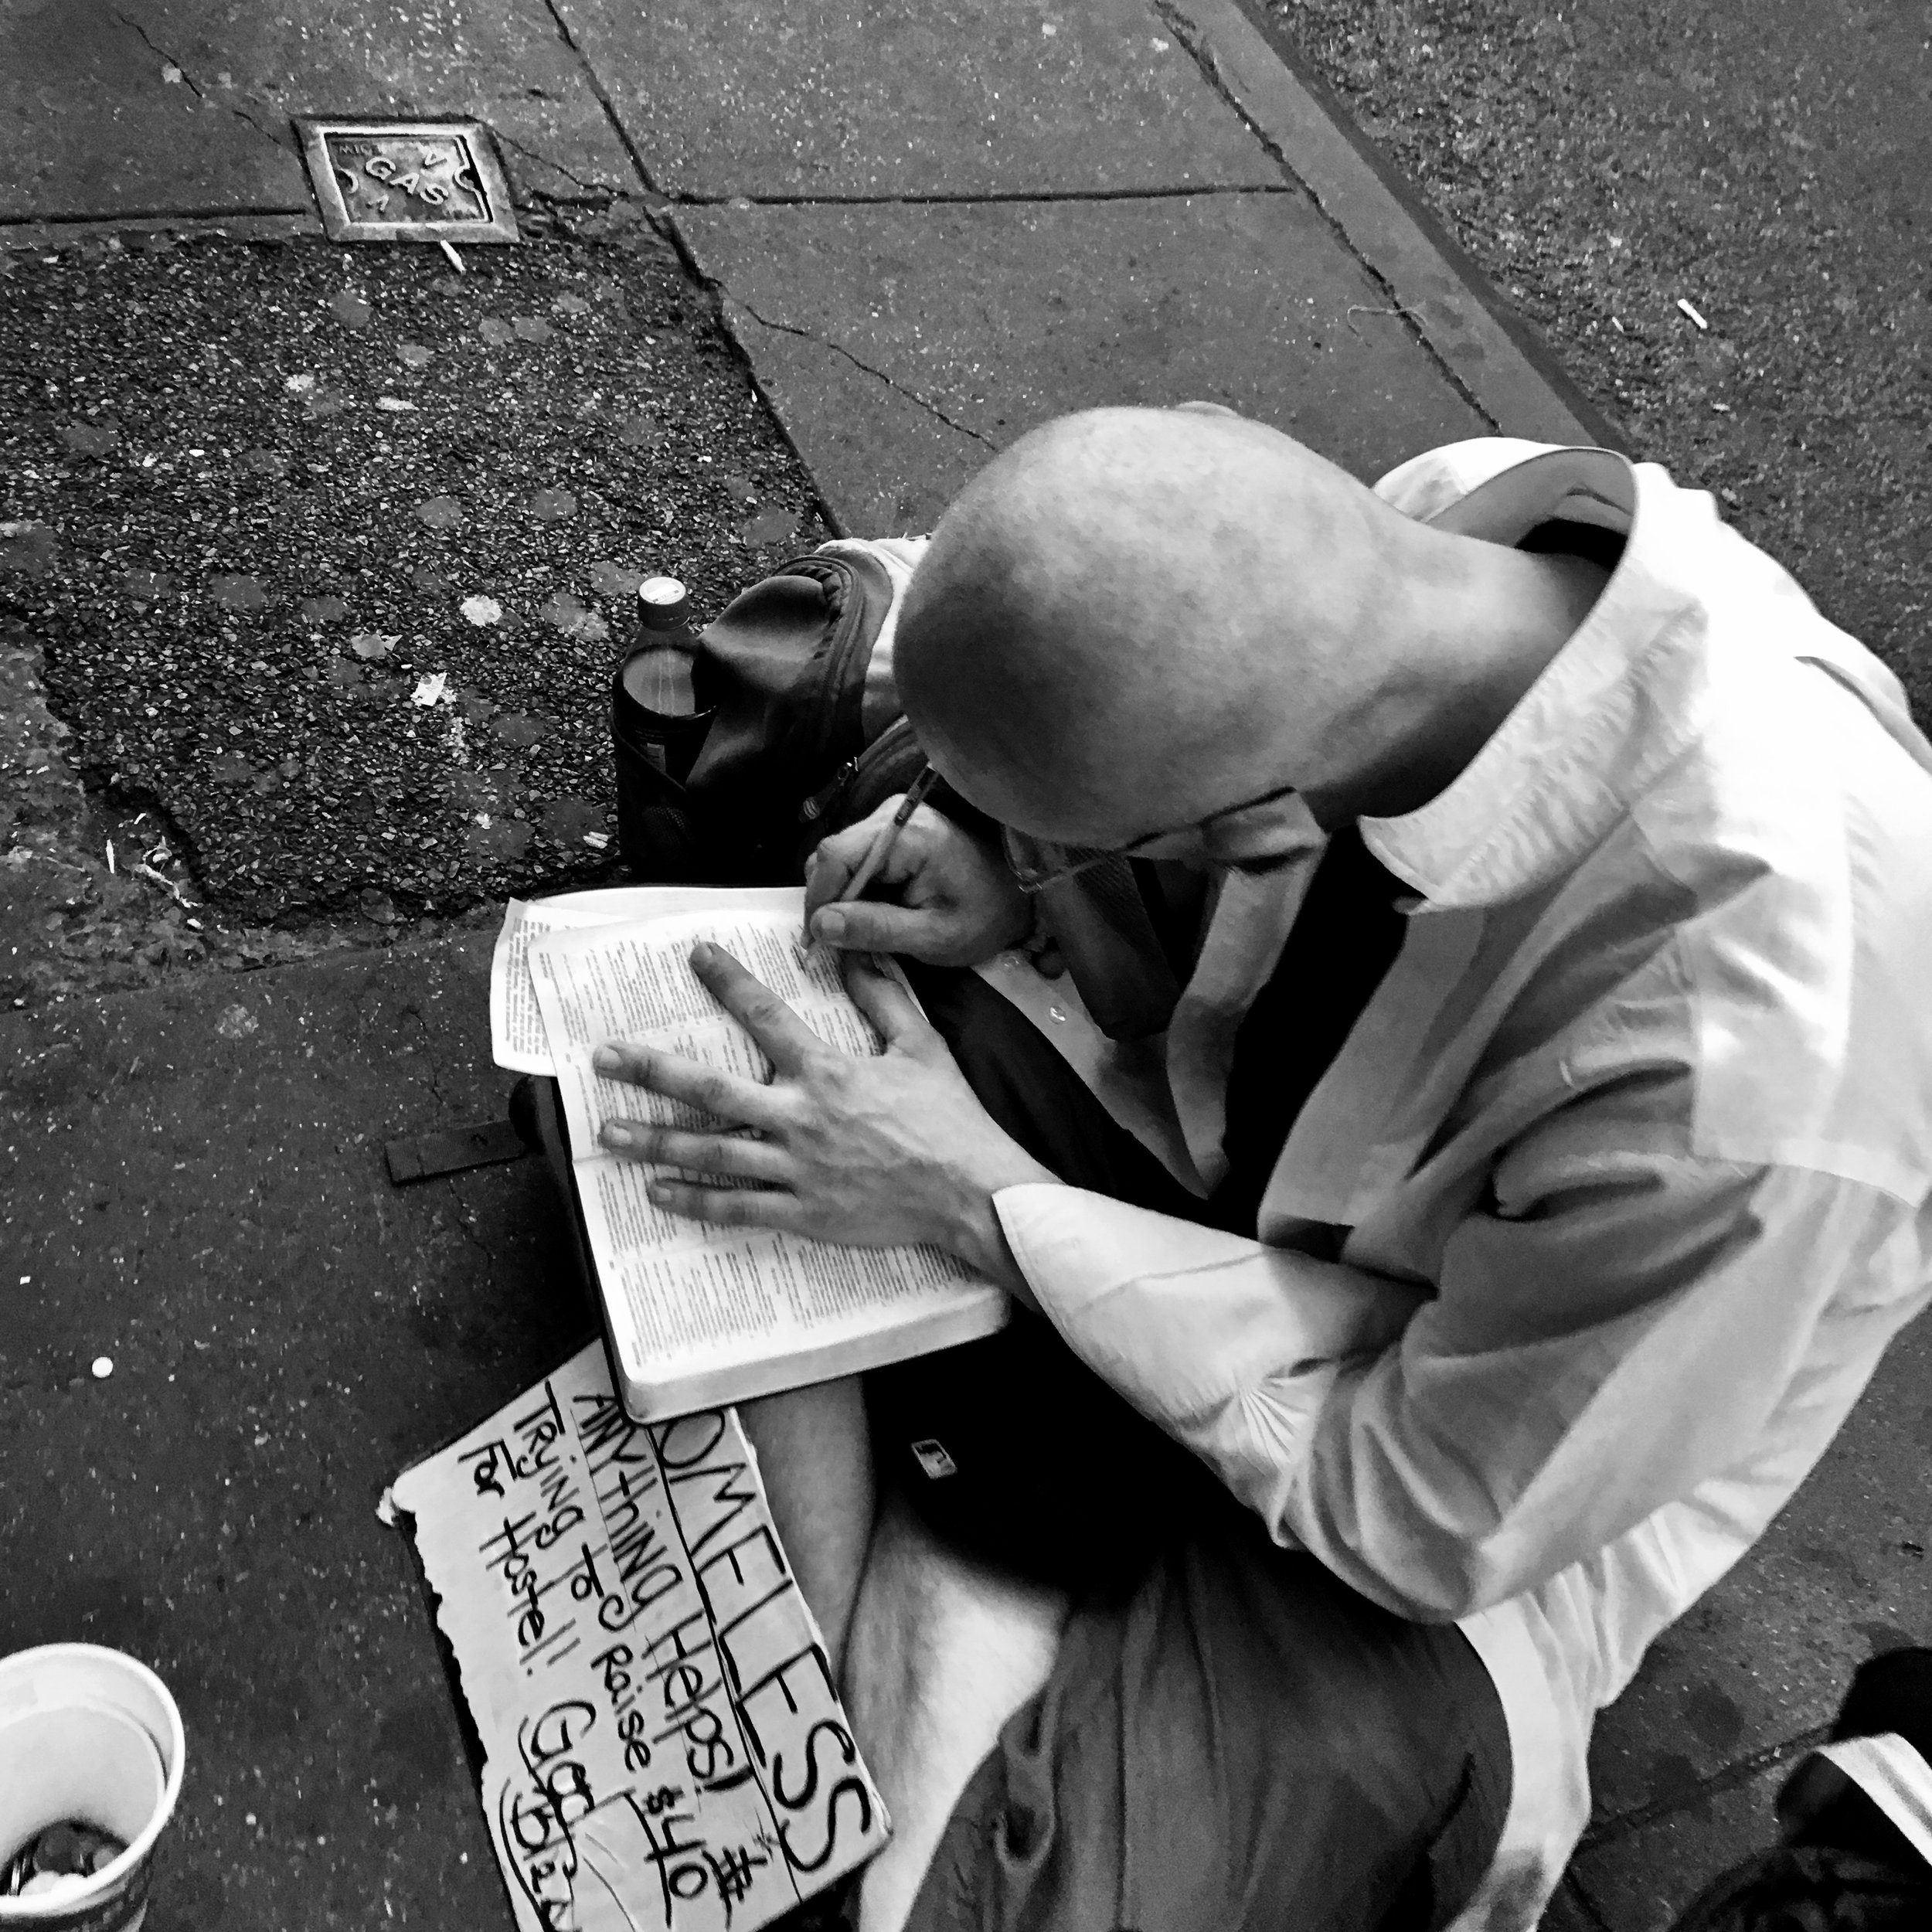 homeless man writing.jpg